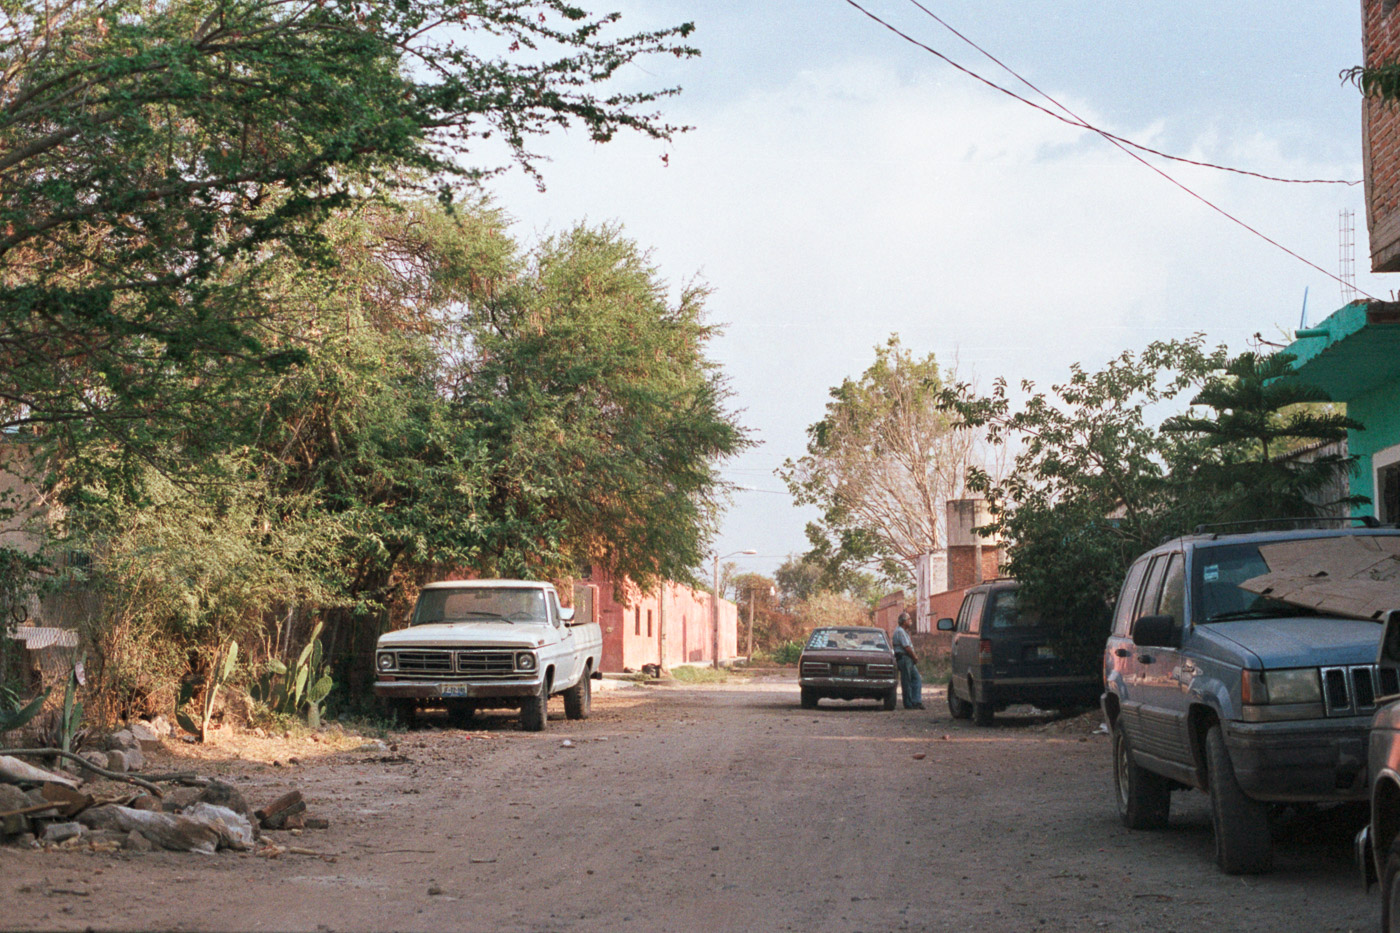 0001-untitled-5-Mexico-Portra-400-21.jpg